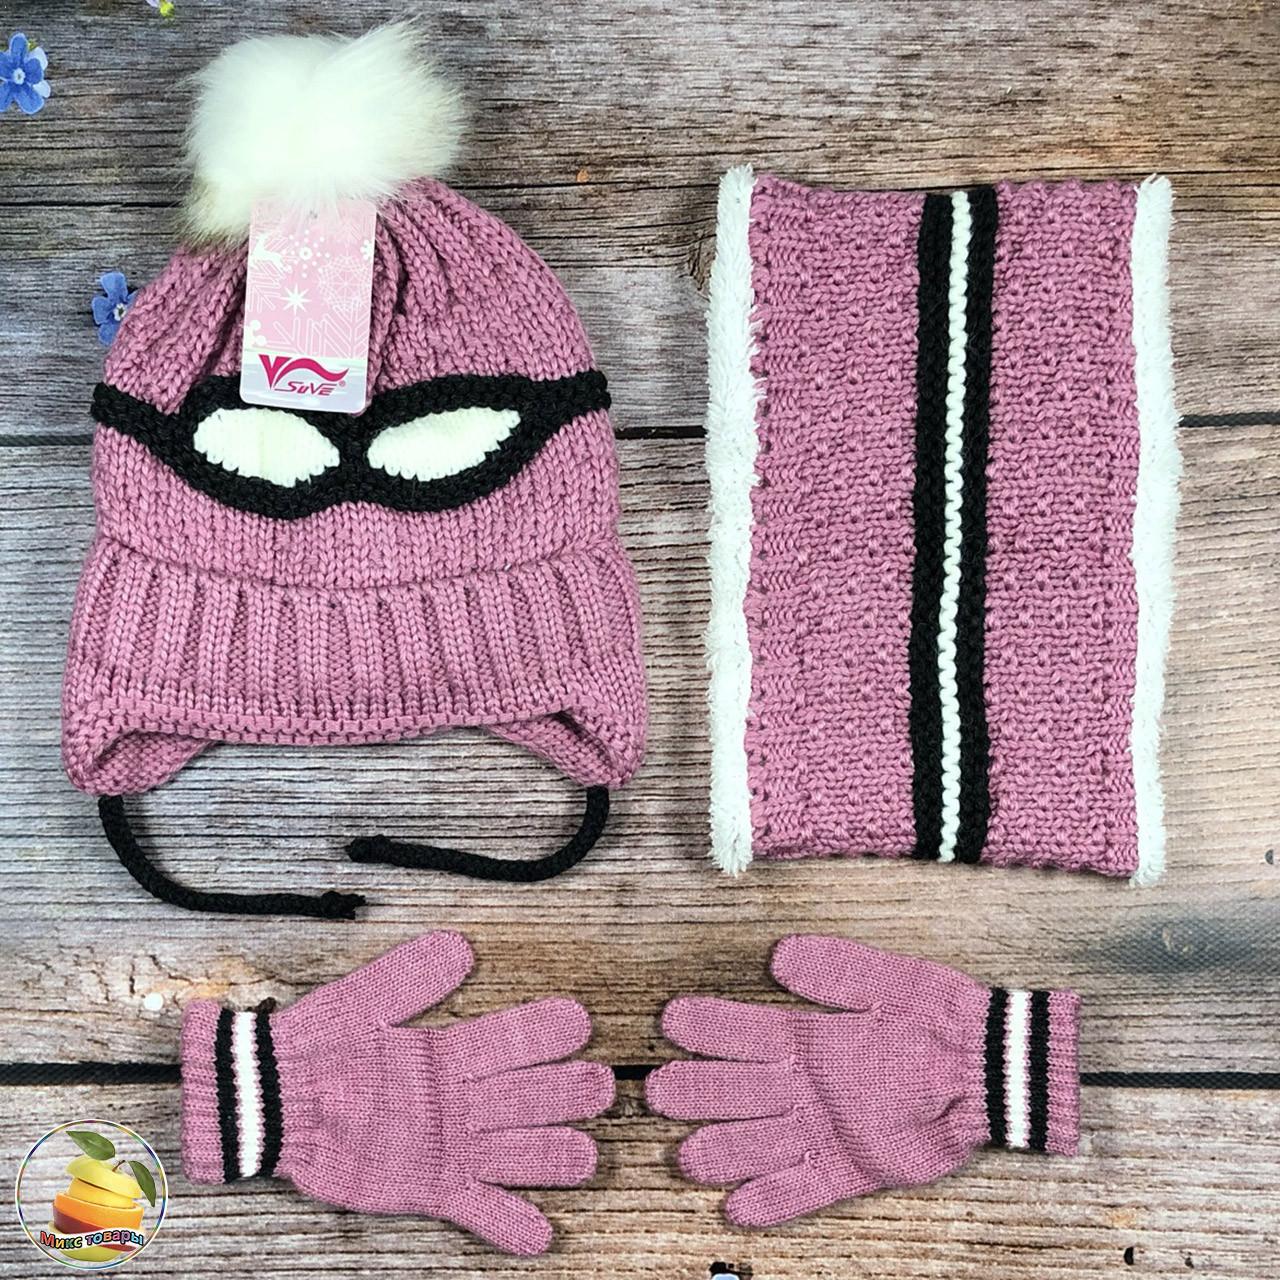 Турецкий набор для ребёнка- шапка, баф и перчатки Размер: 3- 6 лет (21027)